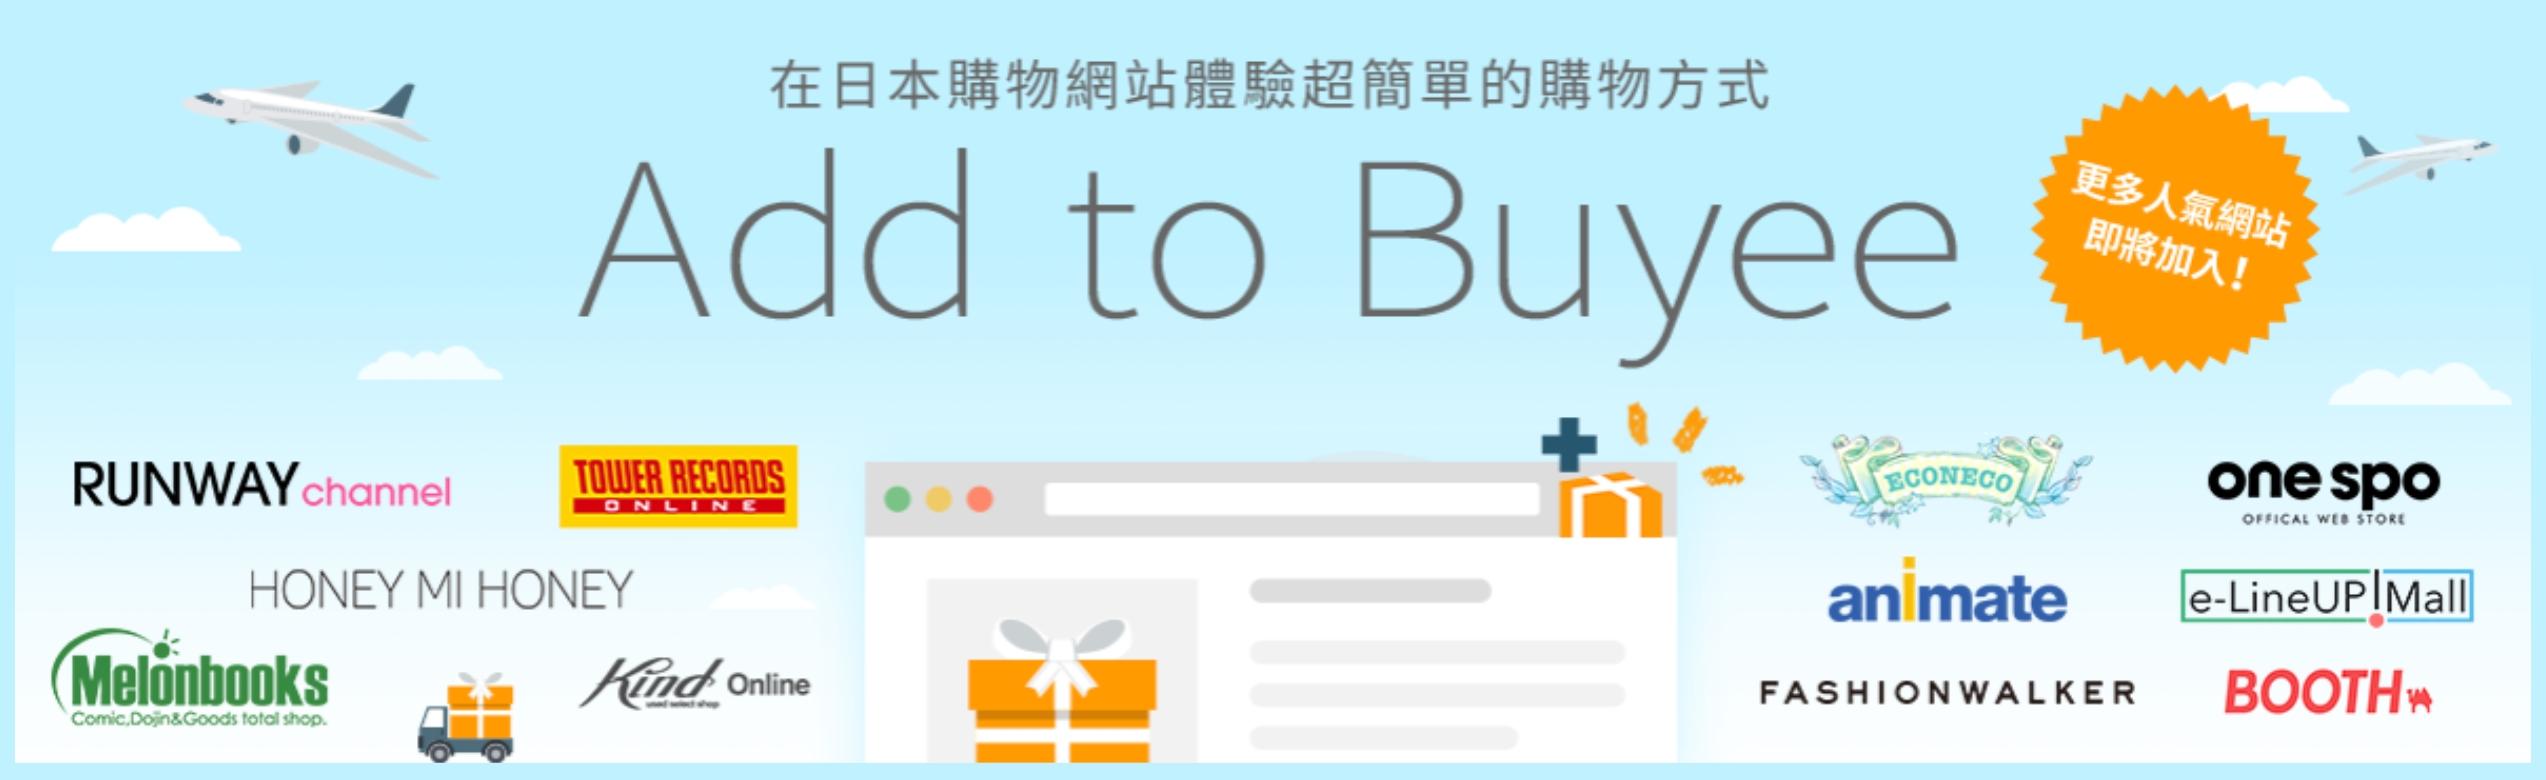 Buyee 日本代購平台 不出國也能買到日本限定商品